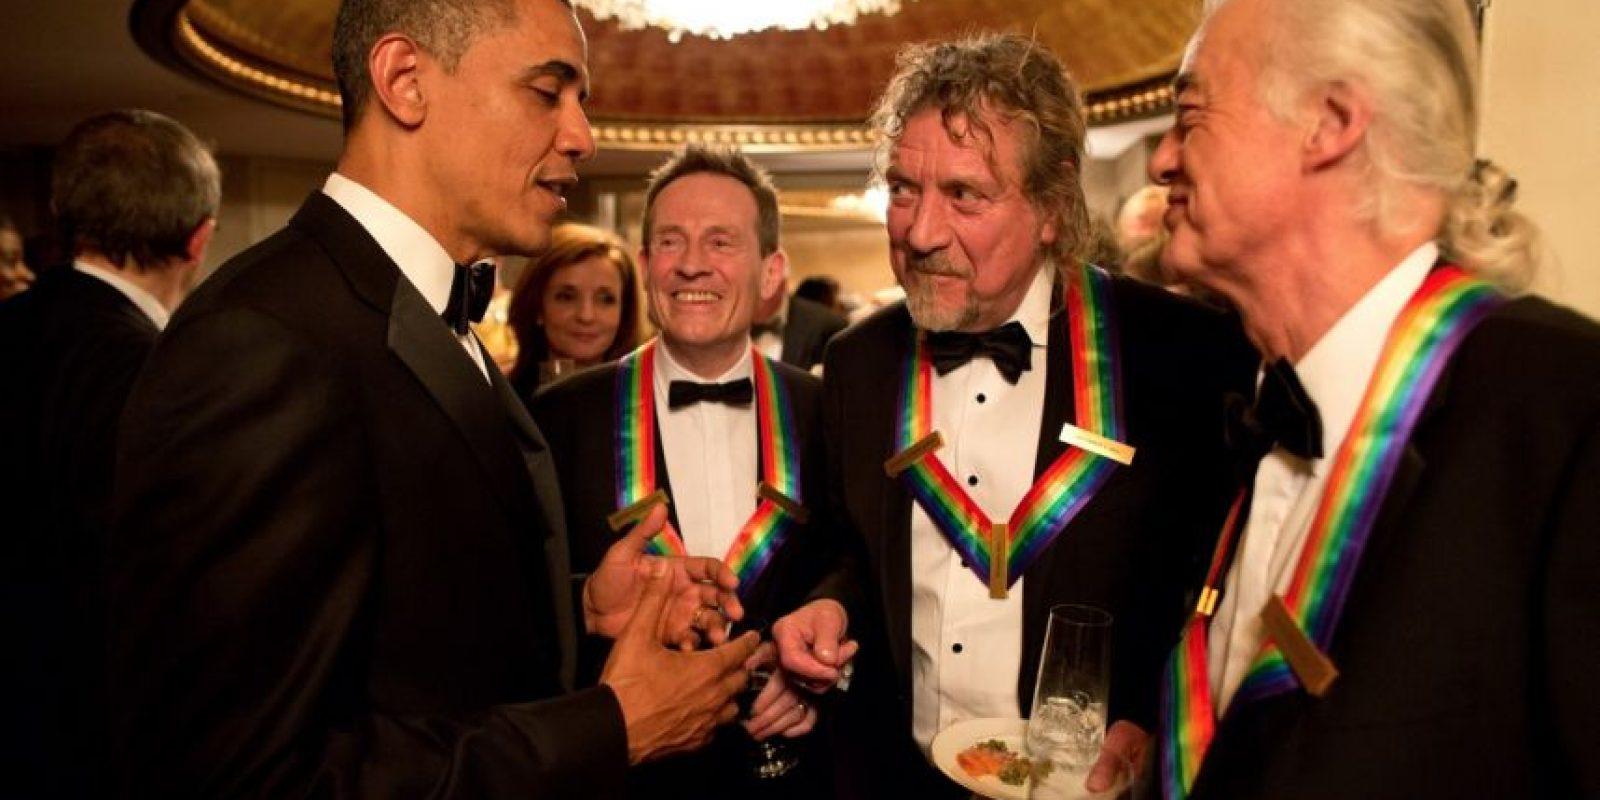 Miembros de la agrupación Led Zeppelin. Foto:Wikipedia.org. Imagen Por: